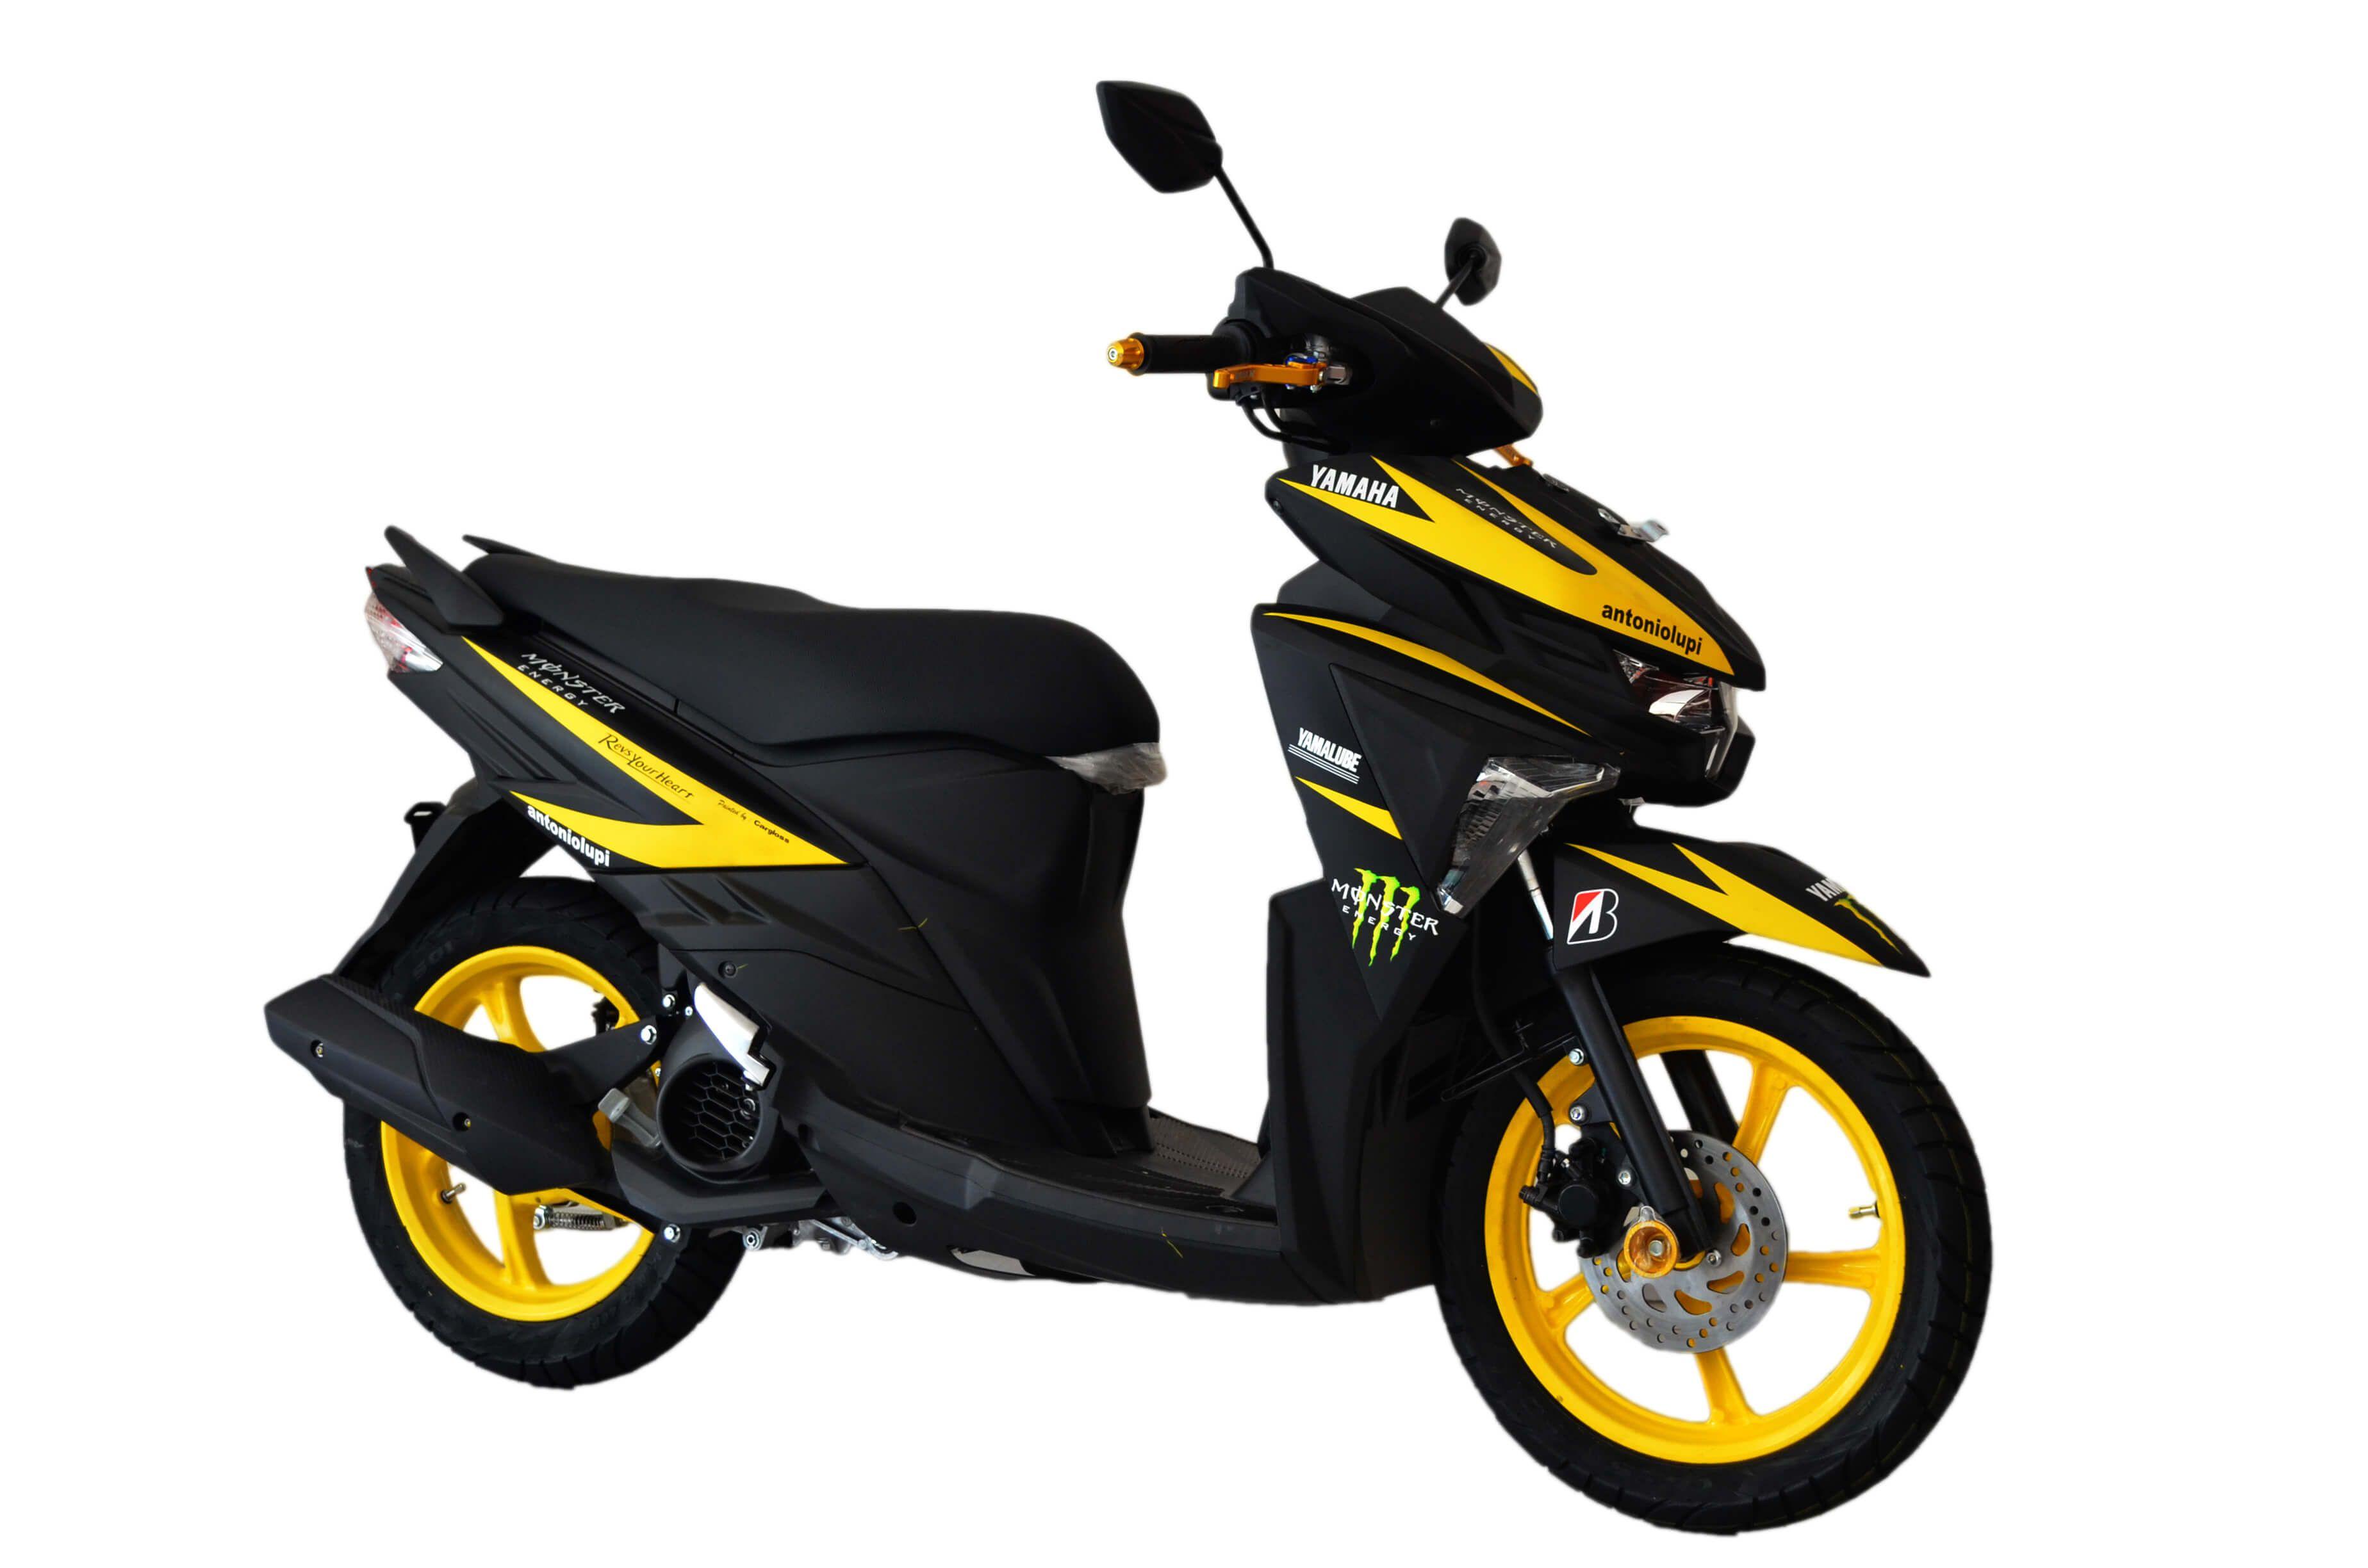 Modifikasi Motor Mio Z 125